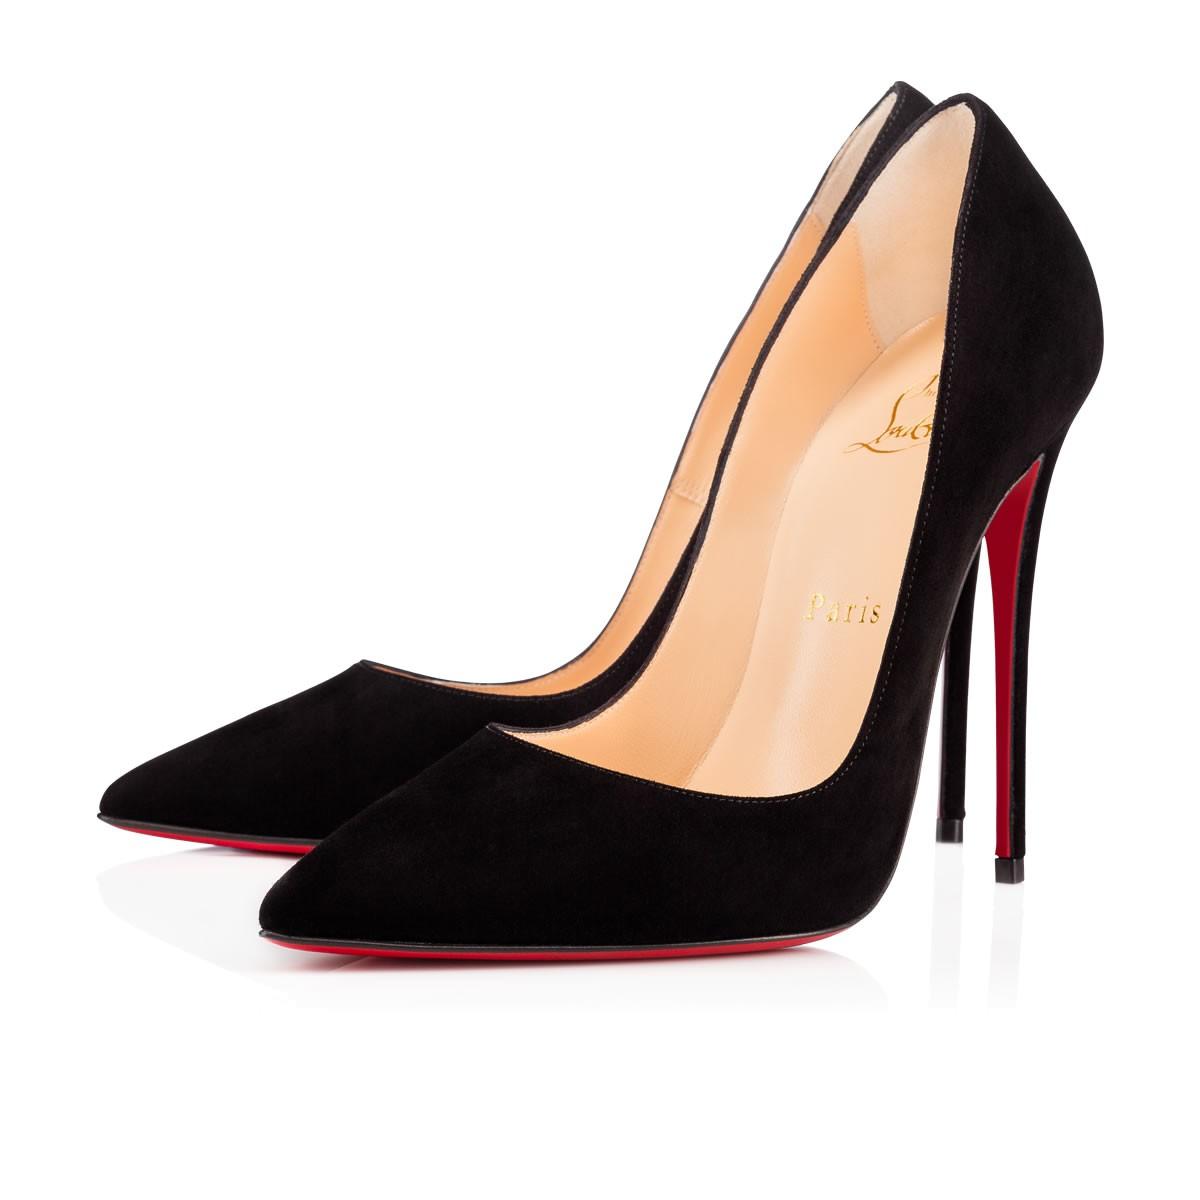 louboutin chaussure femme prix